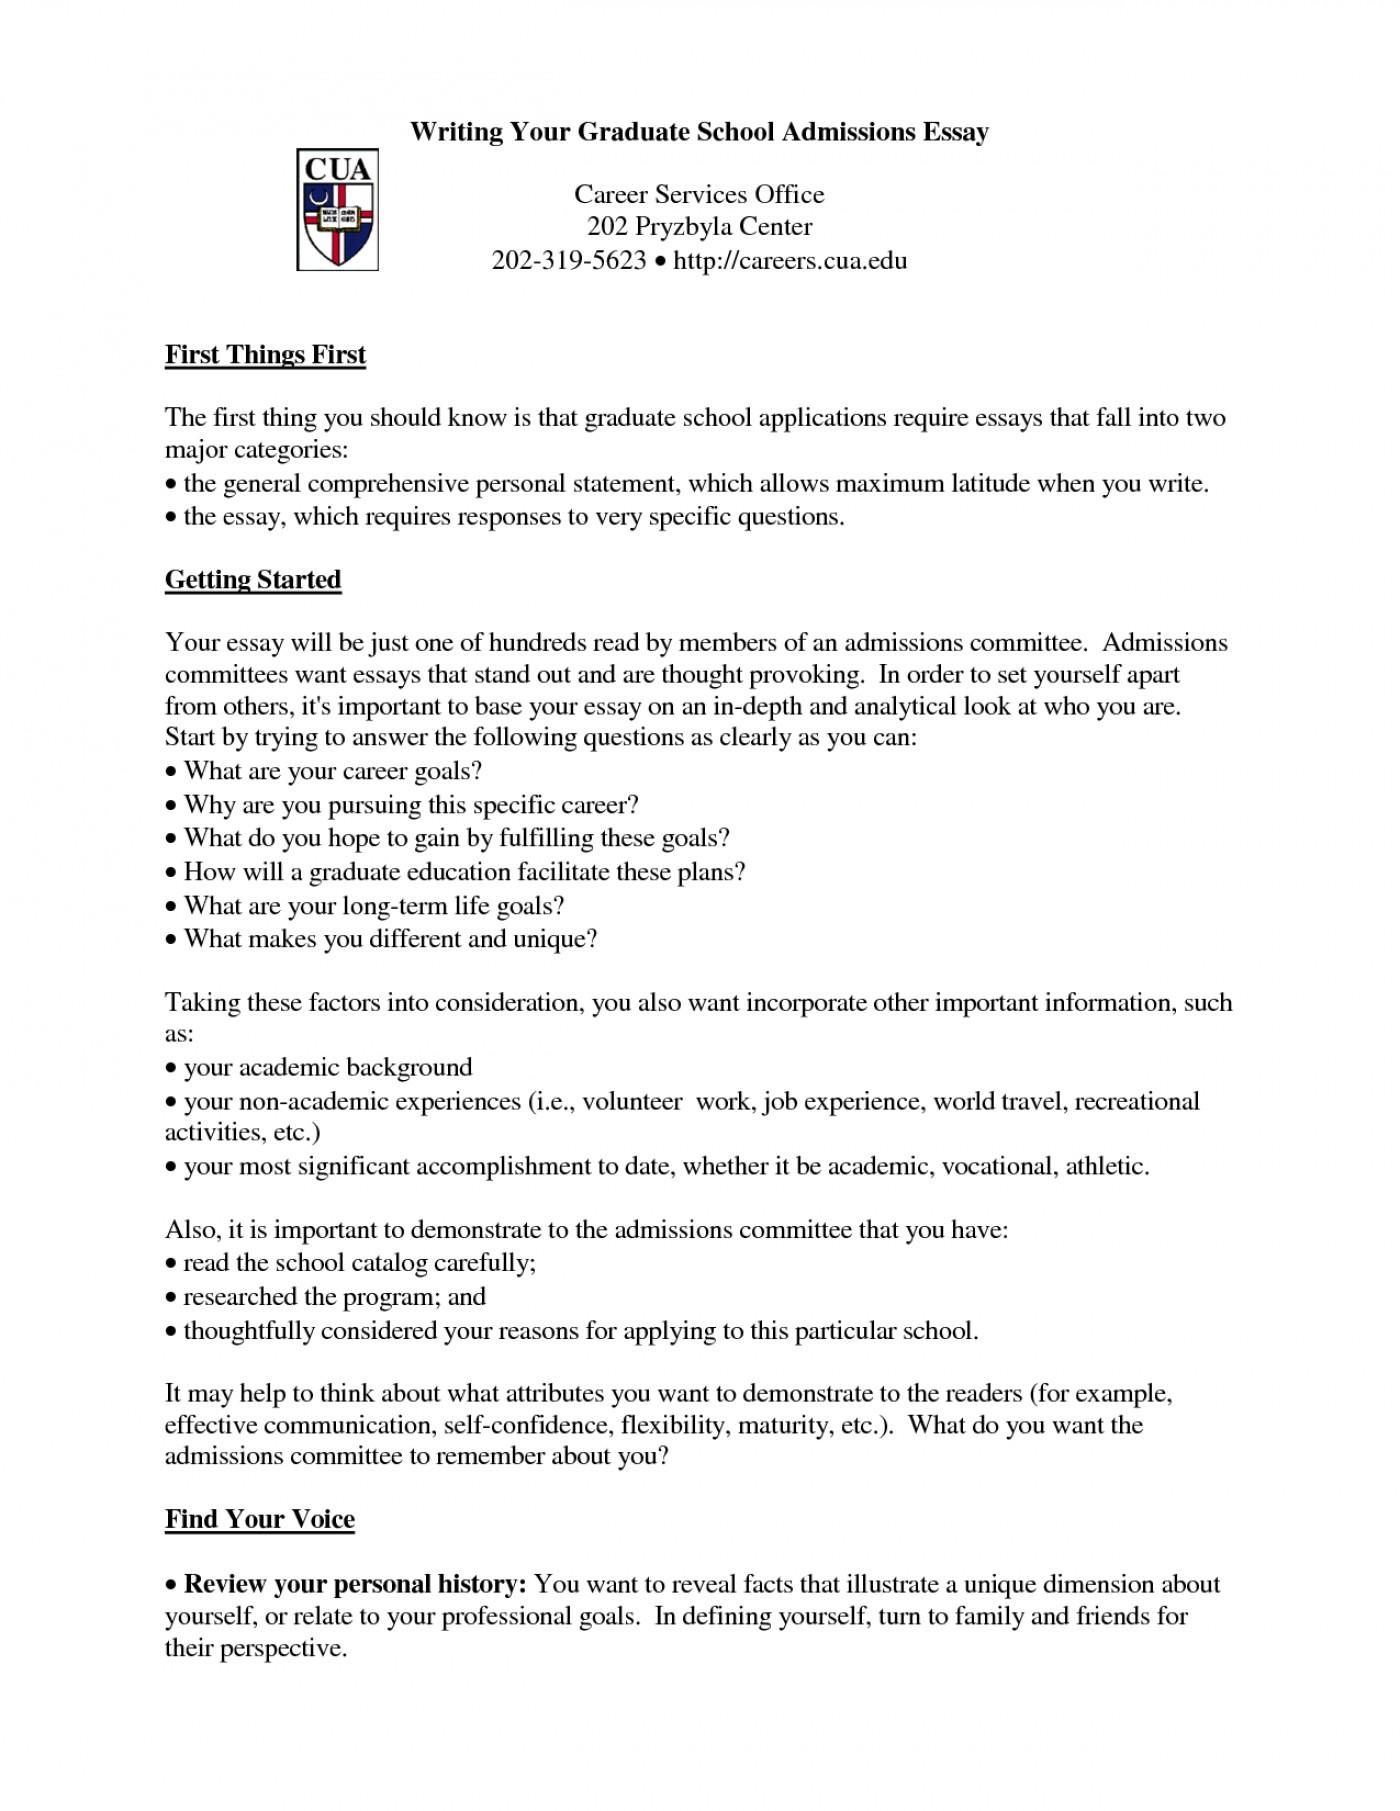 001 Essaymedicalpersonalstatement615b0bd1 Essay For Graduate Admission Surprising Nursing School Personal 1400